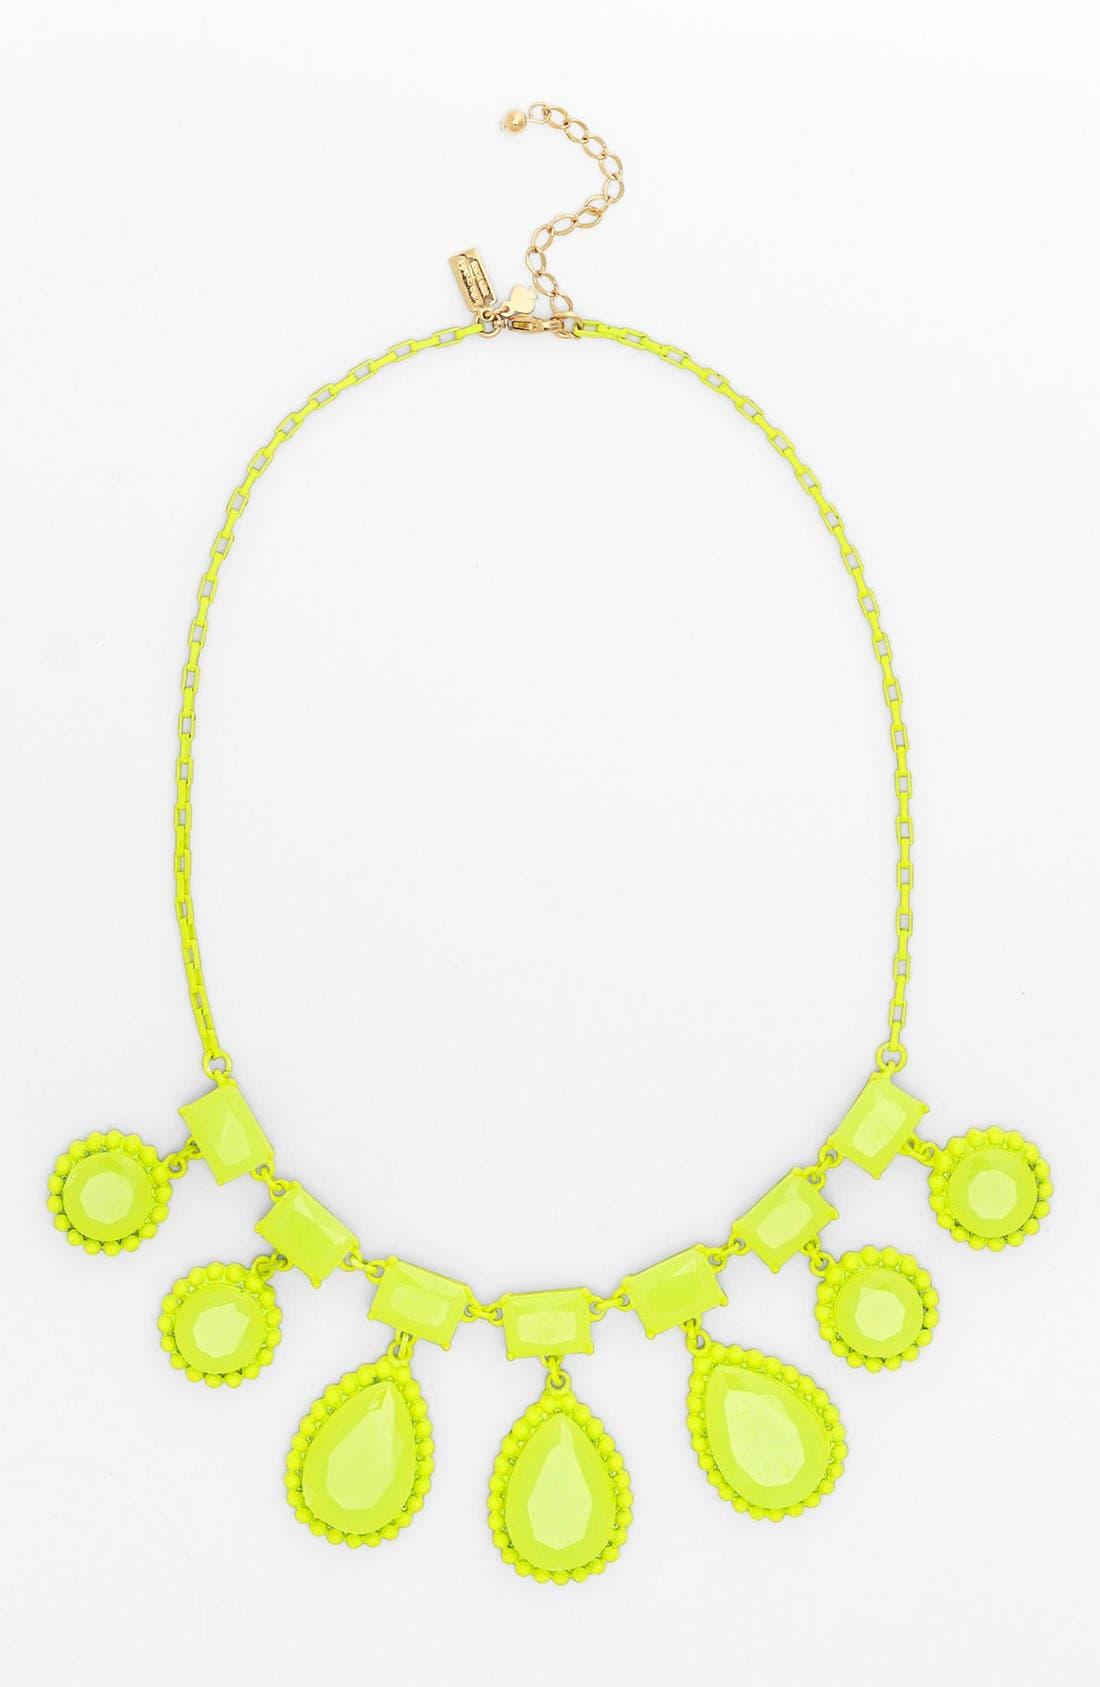 Main Image - kate spade new york 'painted jewels' bib statement necklace